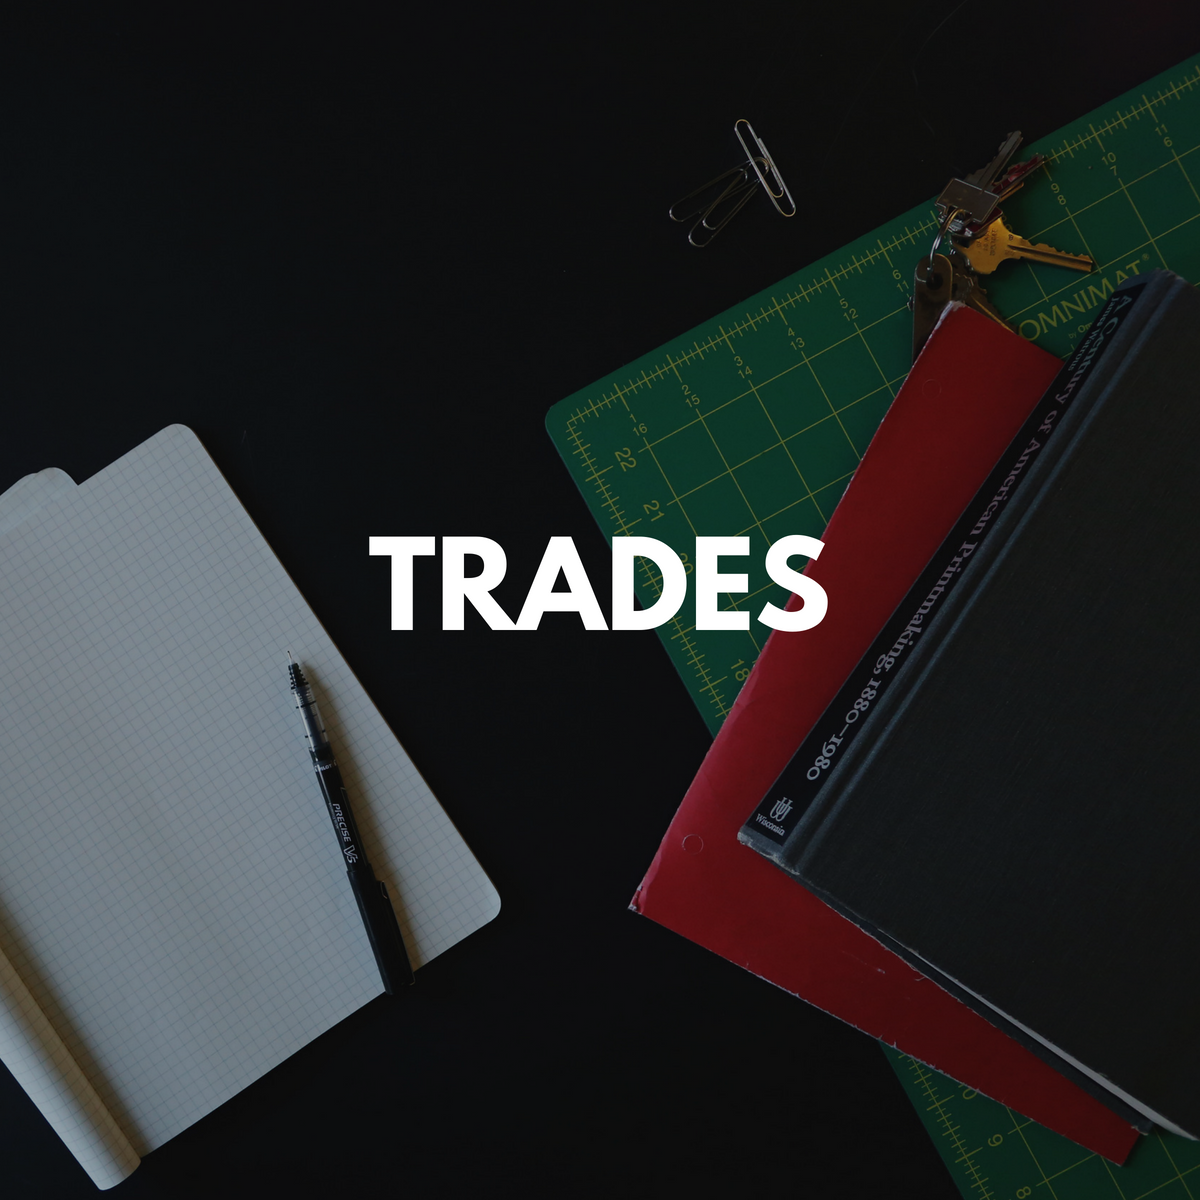 Trades Training